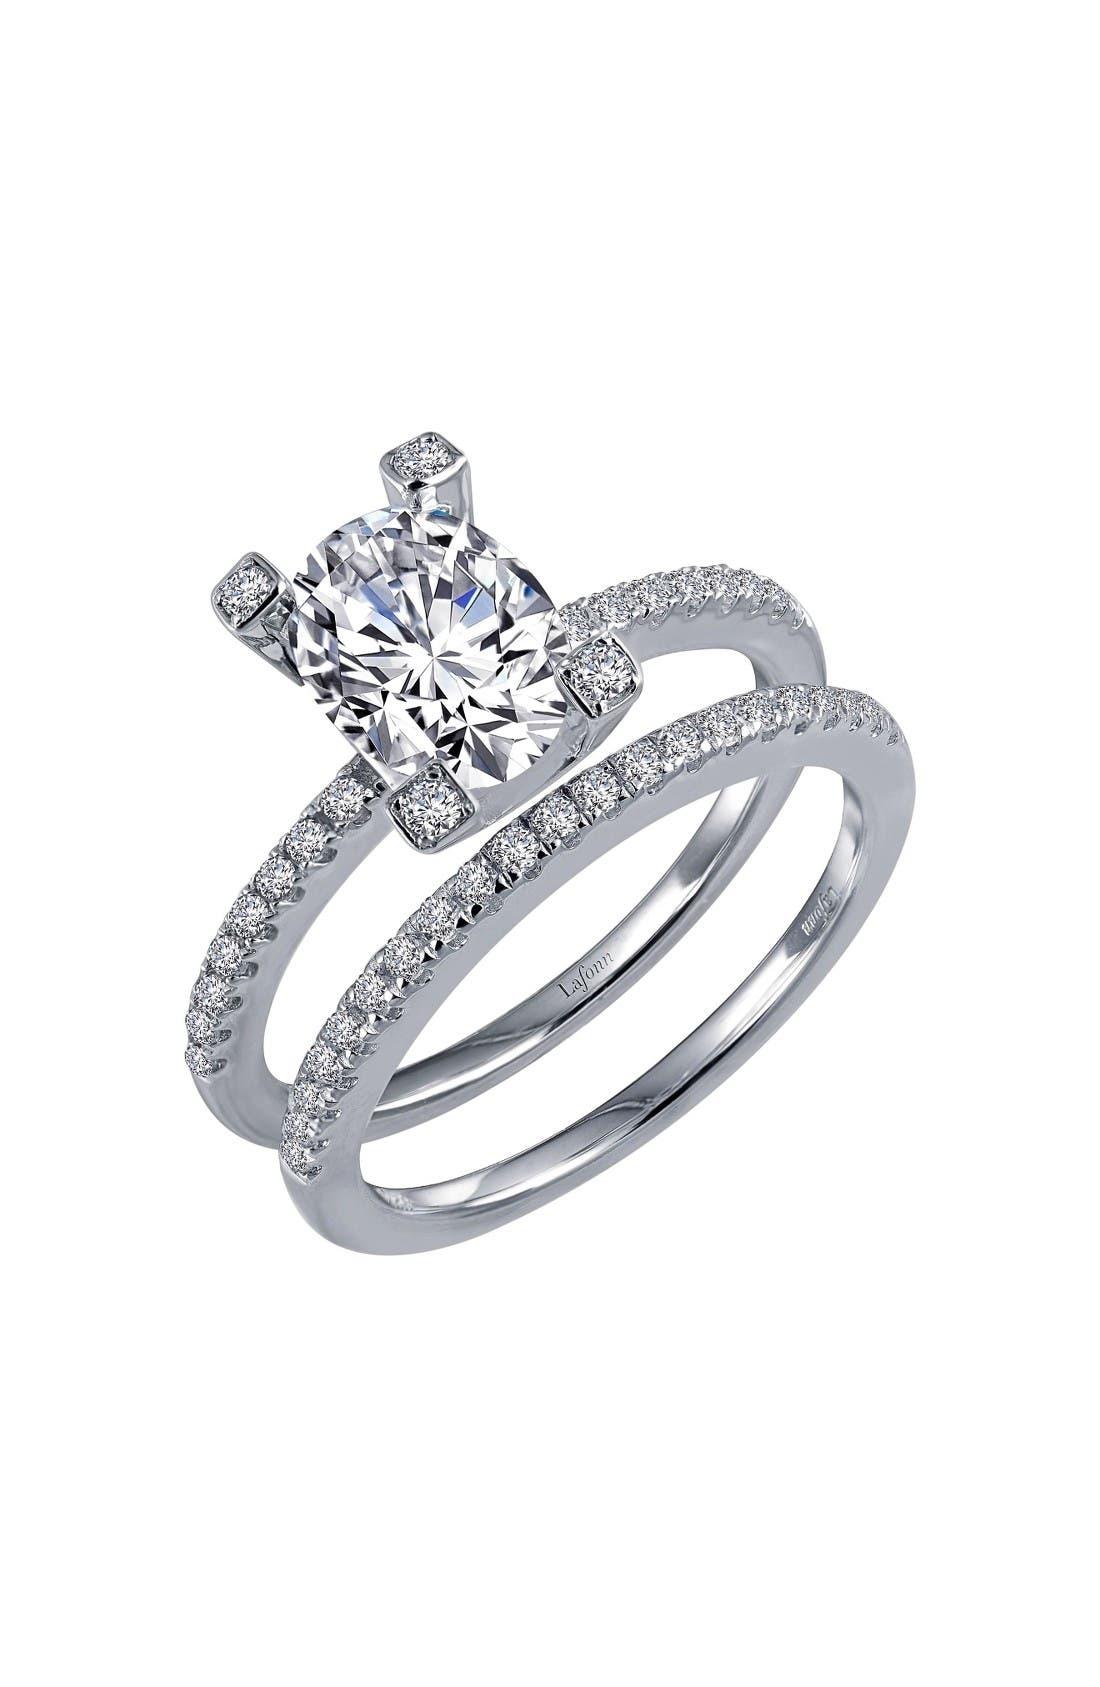 Main Image - Lafonn Simulated Diamond Openwork Ring